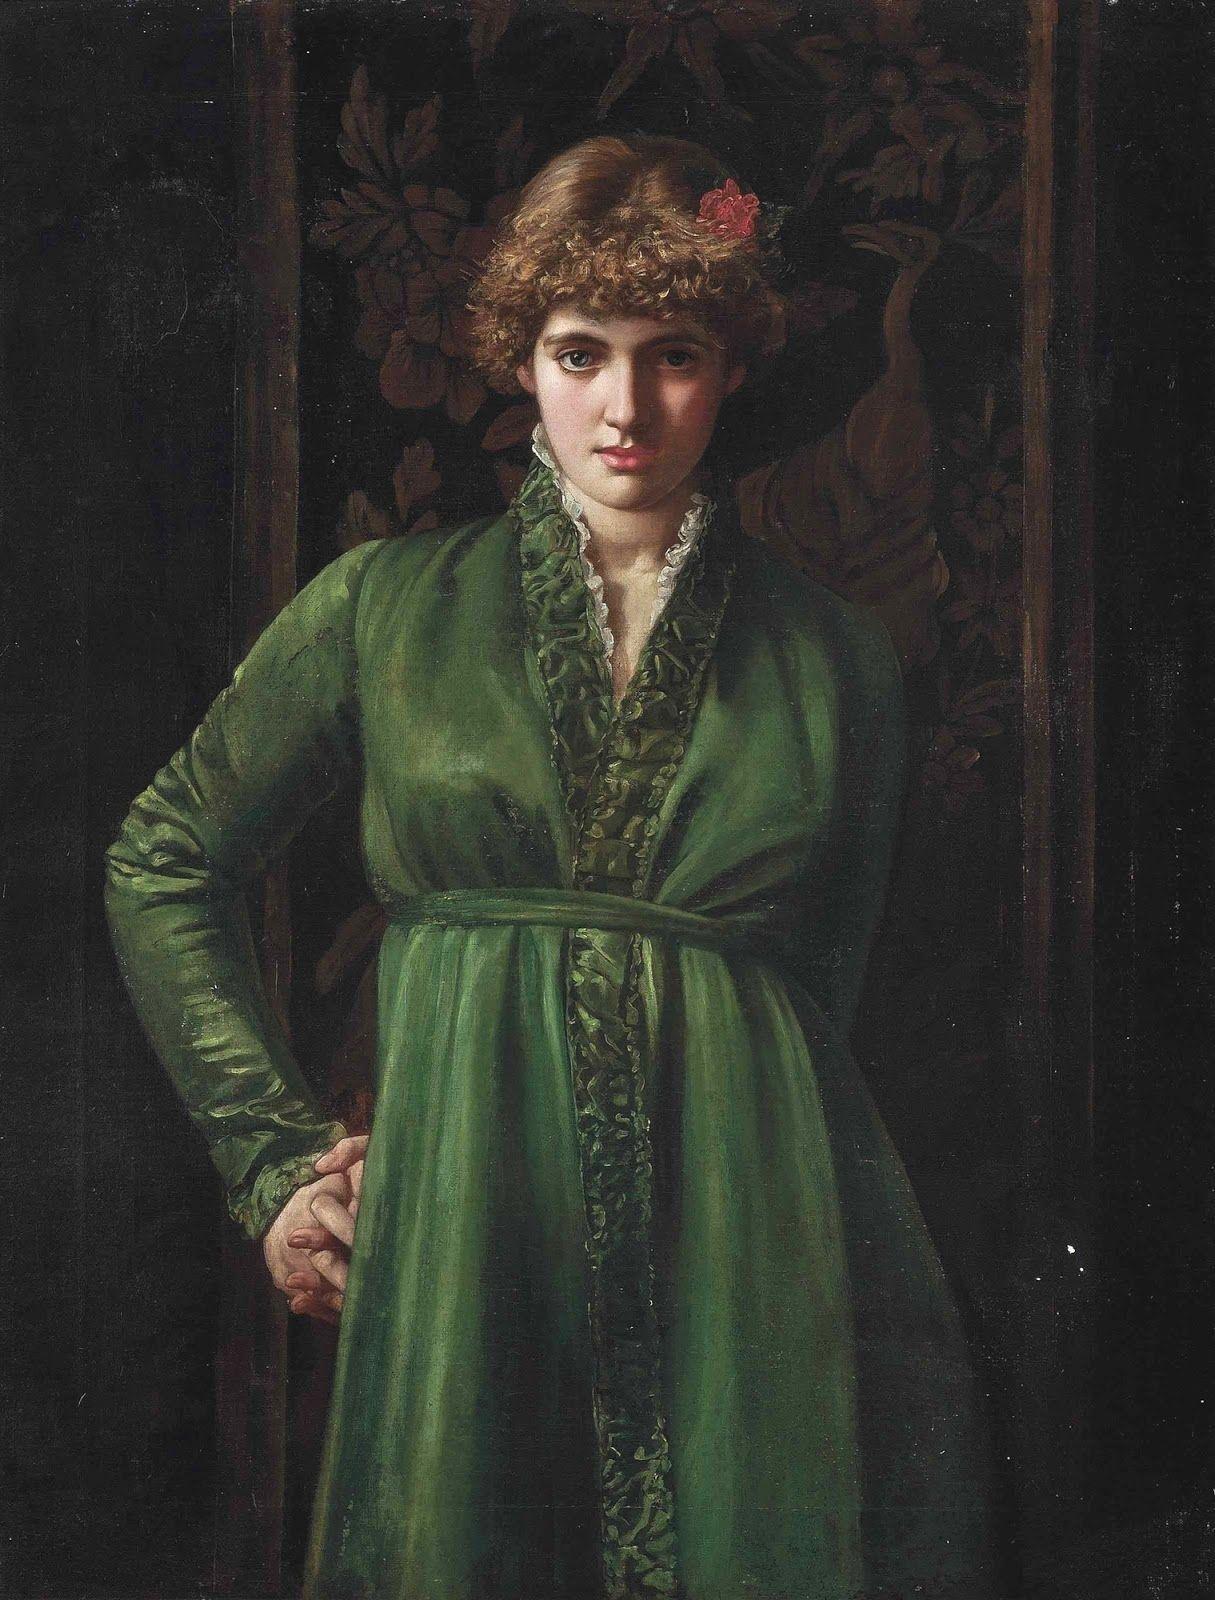 Валентин Кэмерон Принсеп (Valentine Cameron Prinsep), 1838-1904. Англия. Обсуждение на LiveInternet - Российский Сервис Онлайн-Дневников